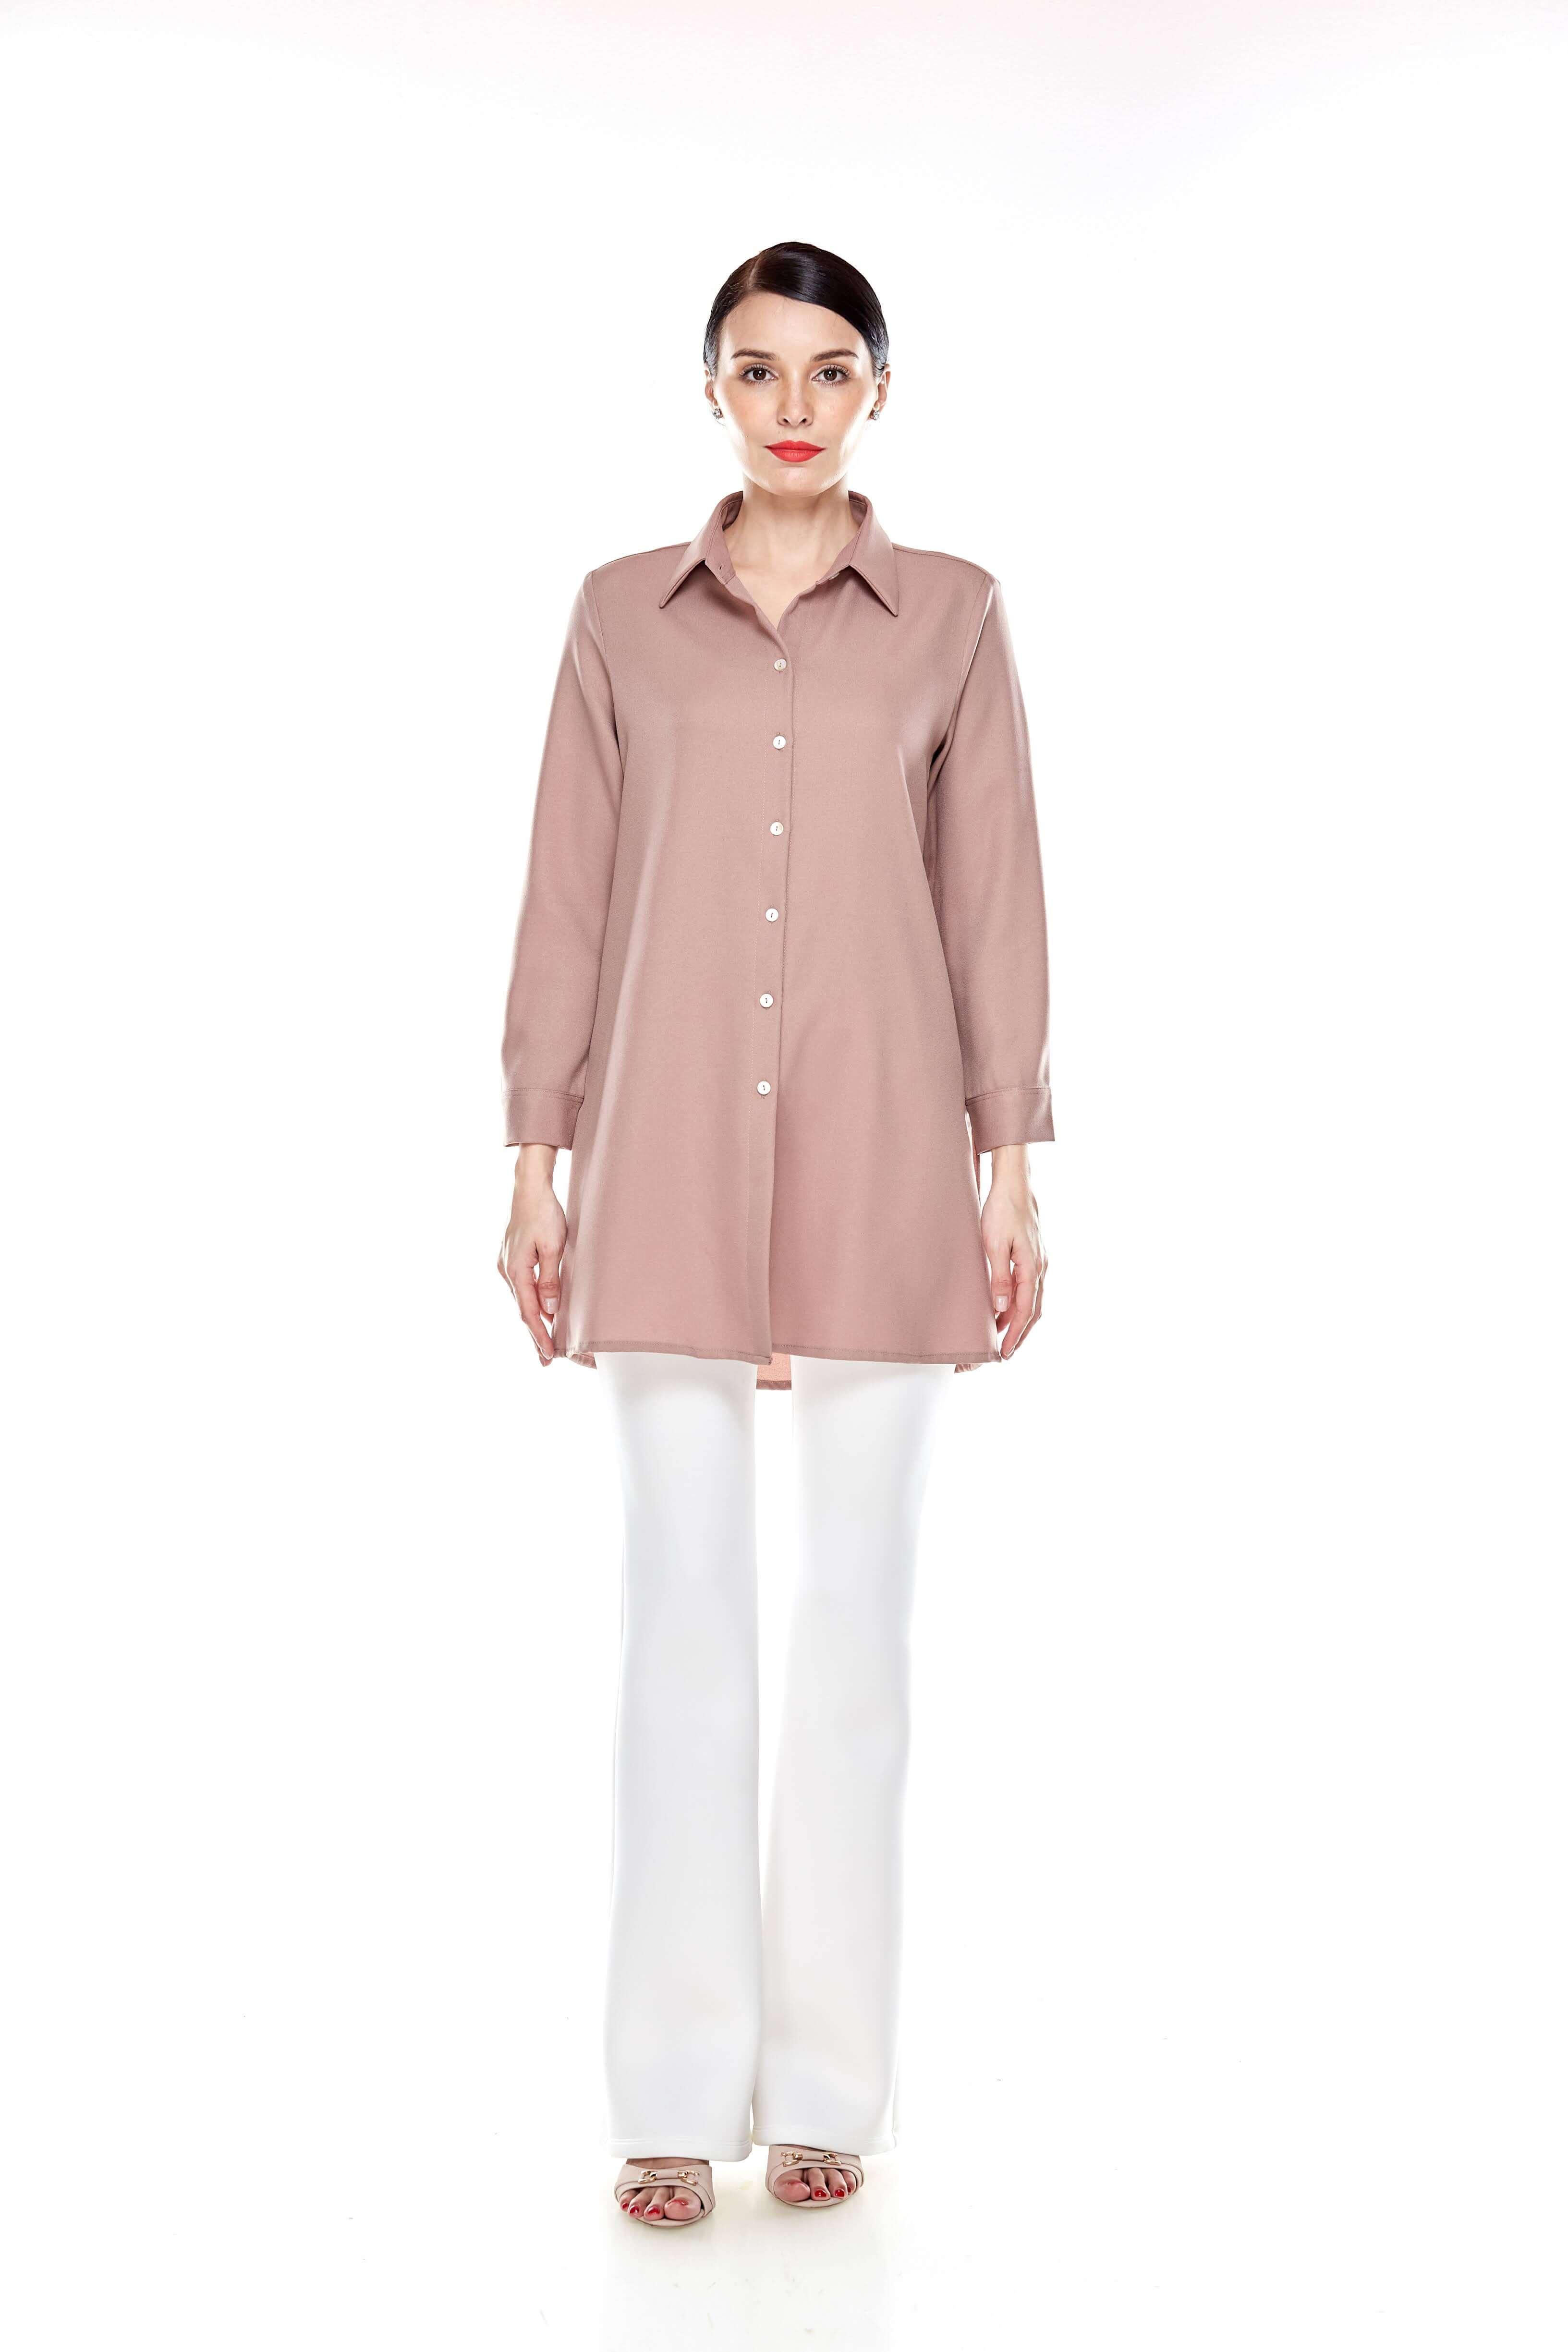 Warm Taupe Shirt Blouse (2)